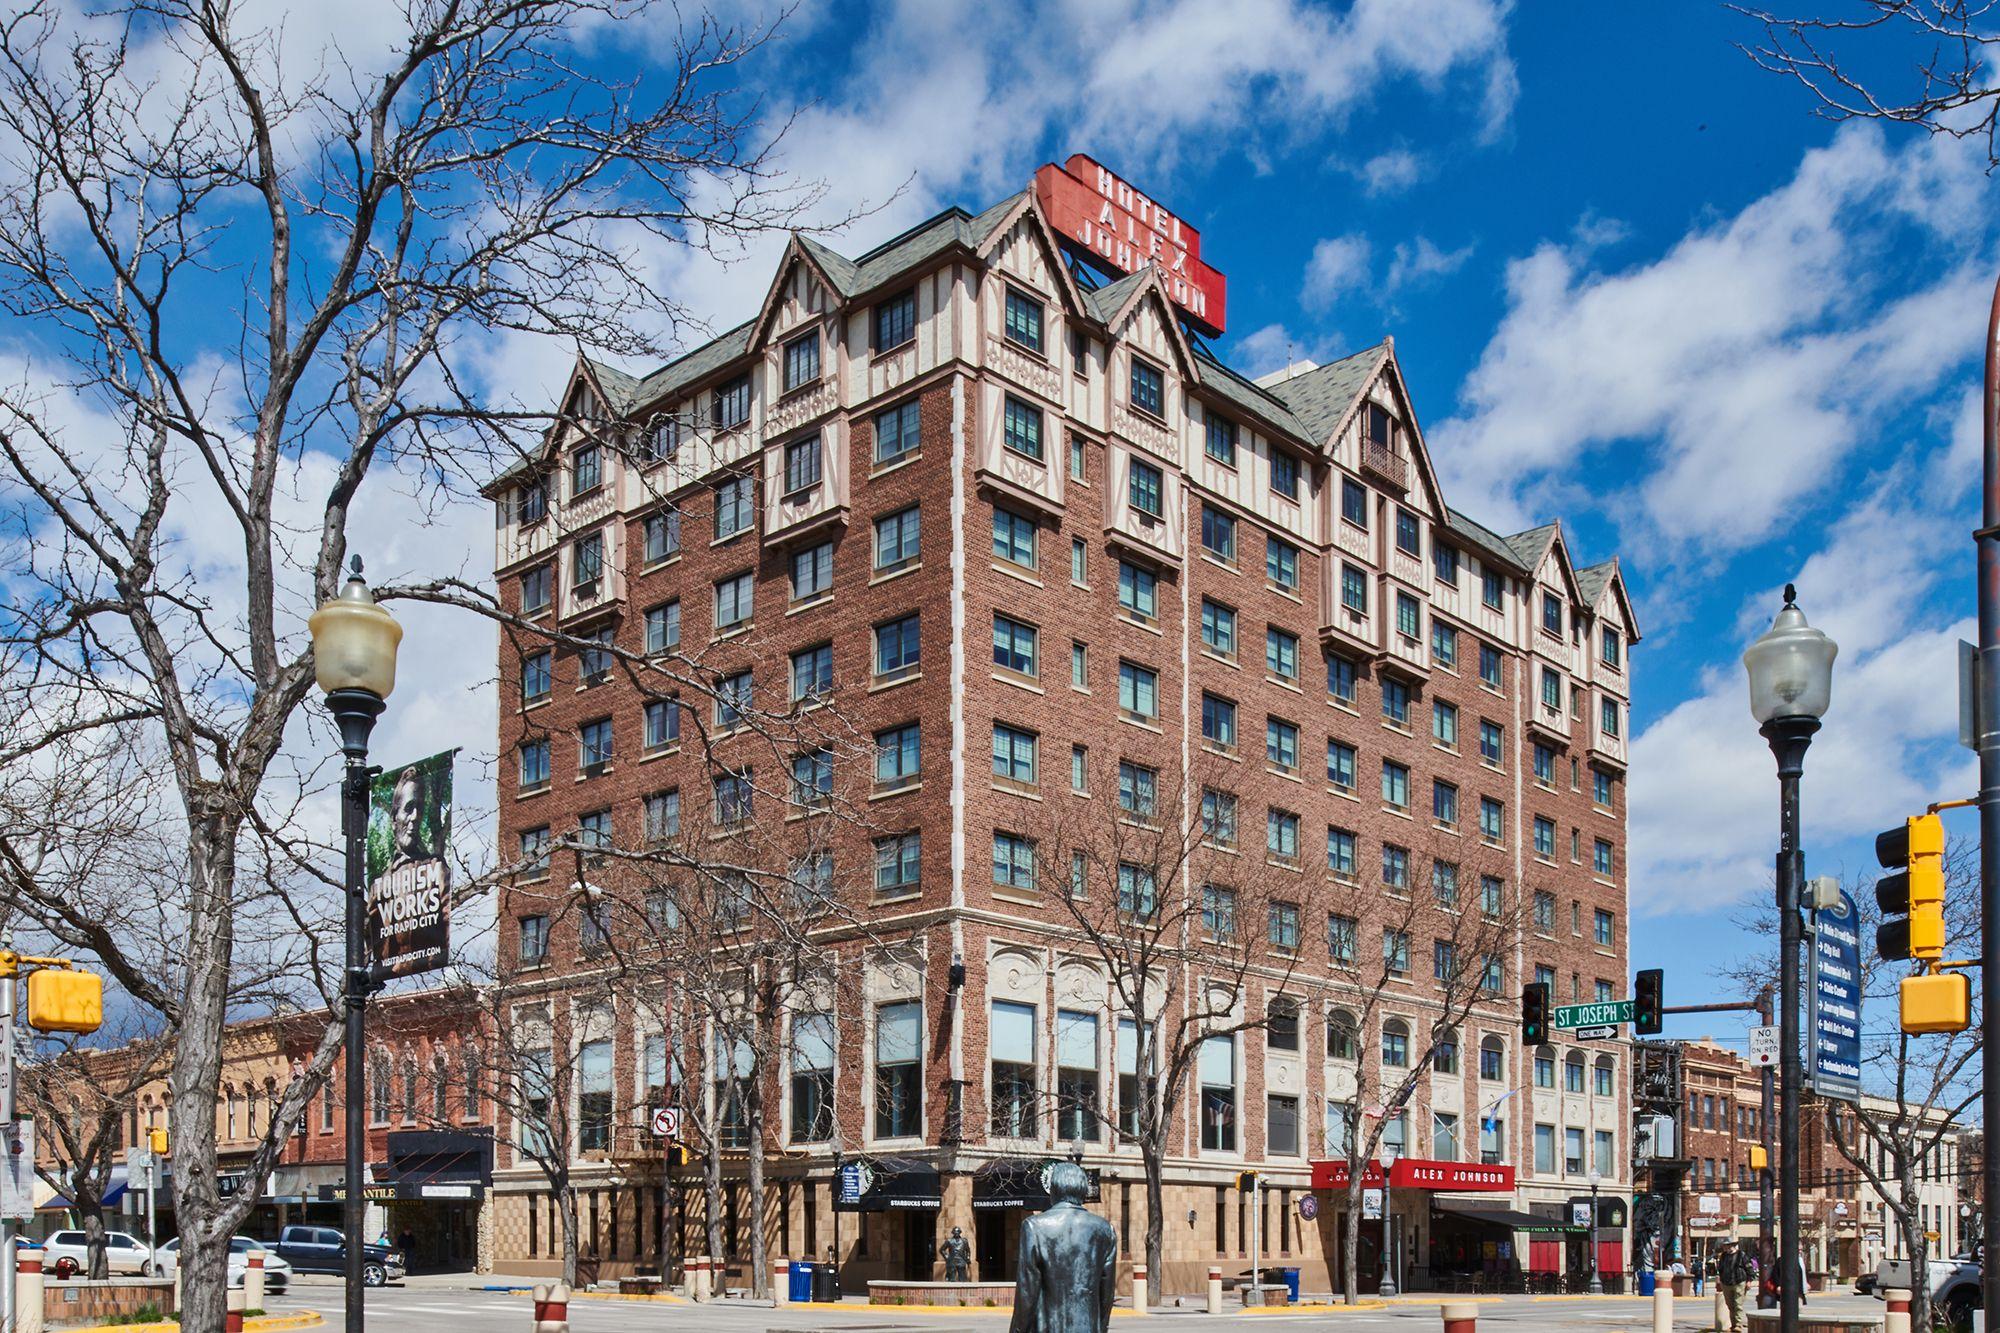 002 Hotel Alex Johnson - Curio Collection by Hilton.jpg